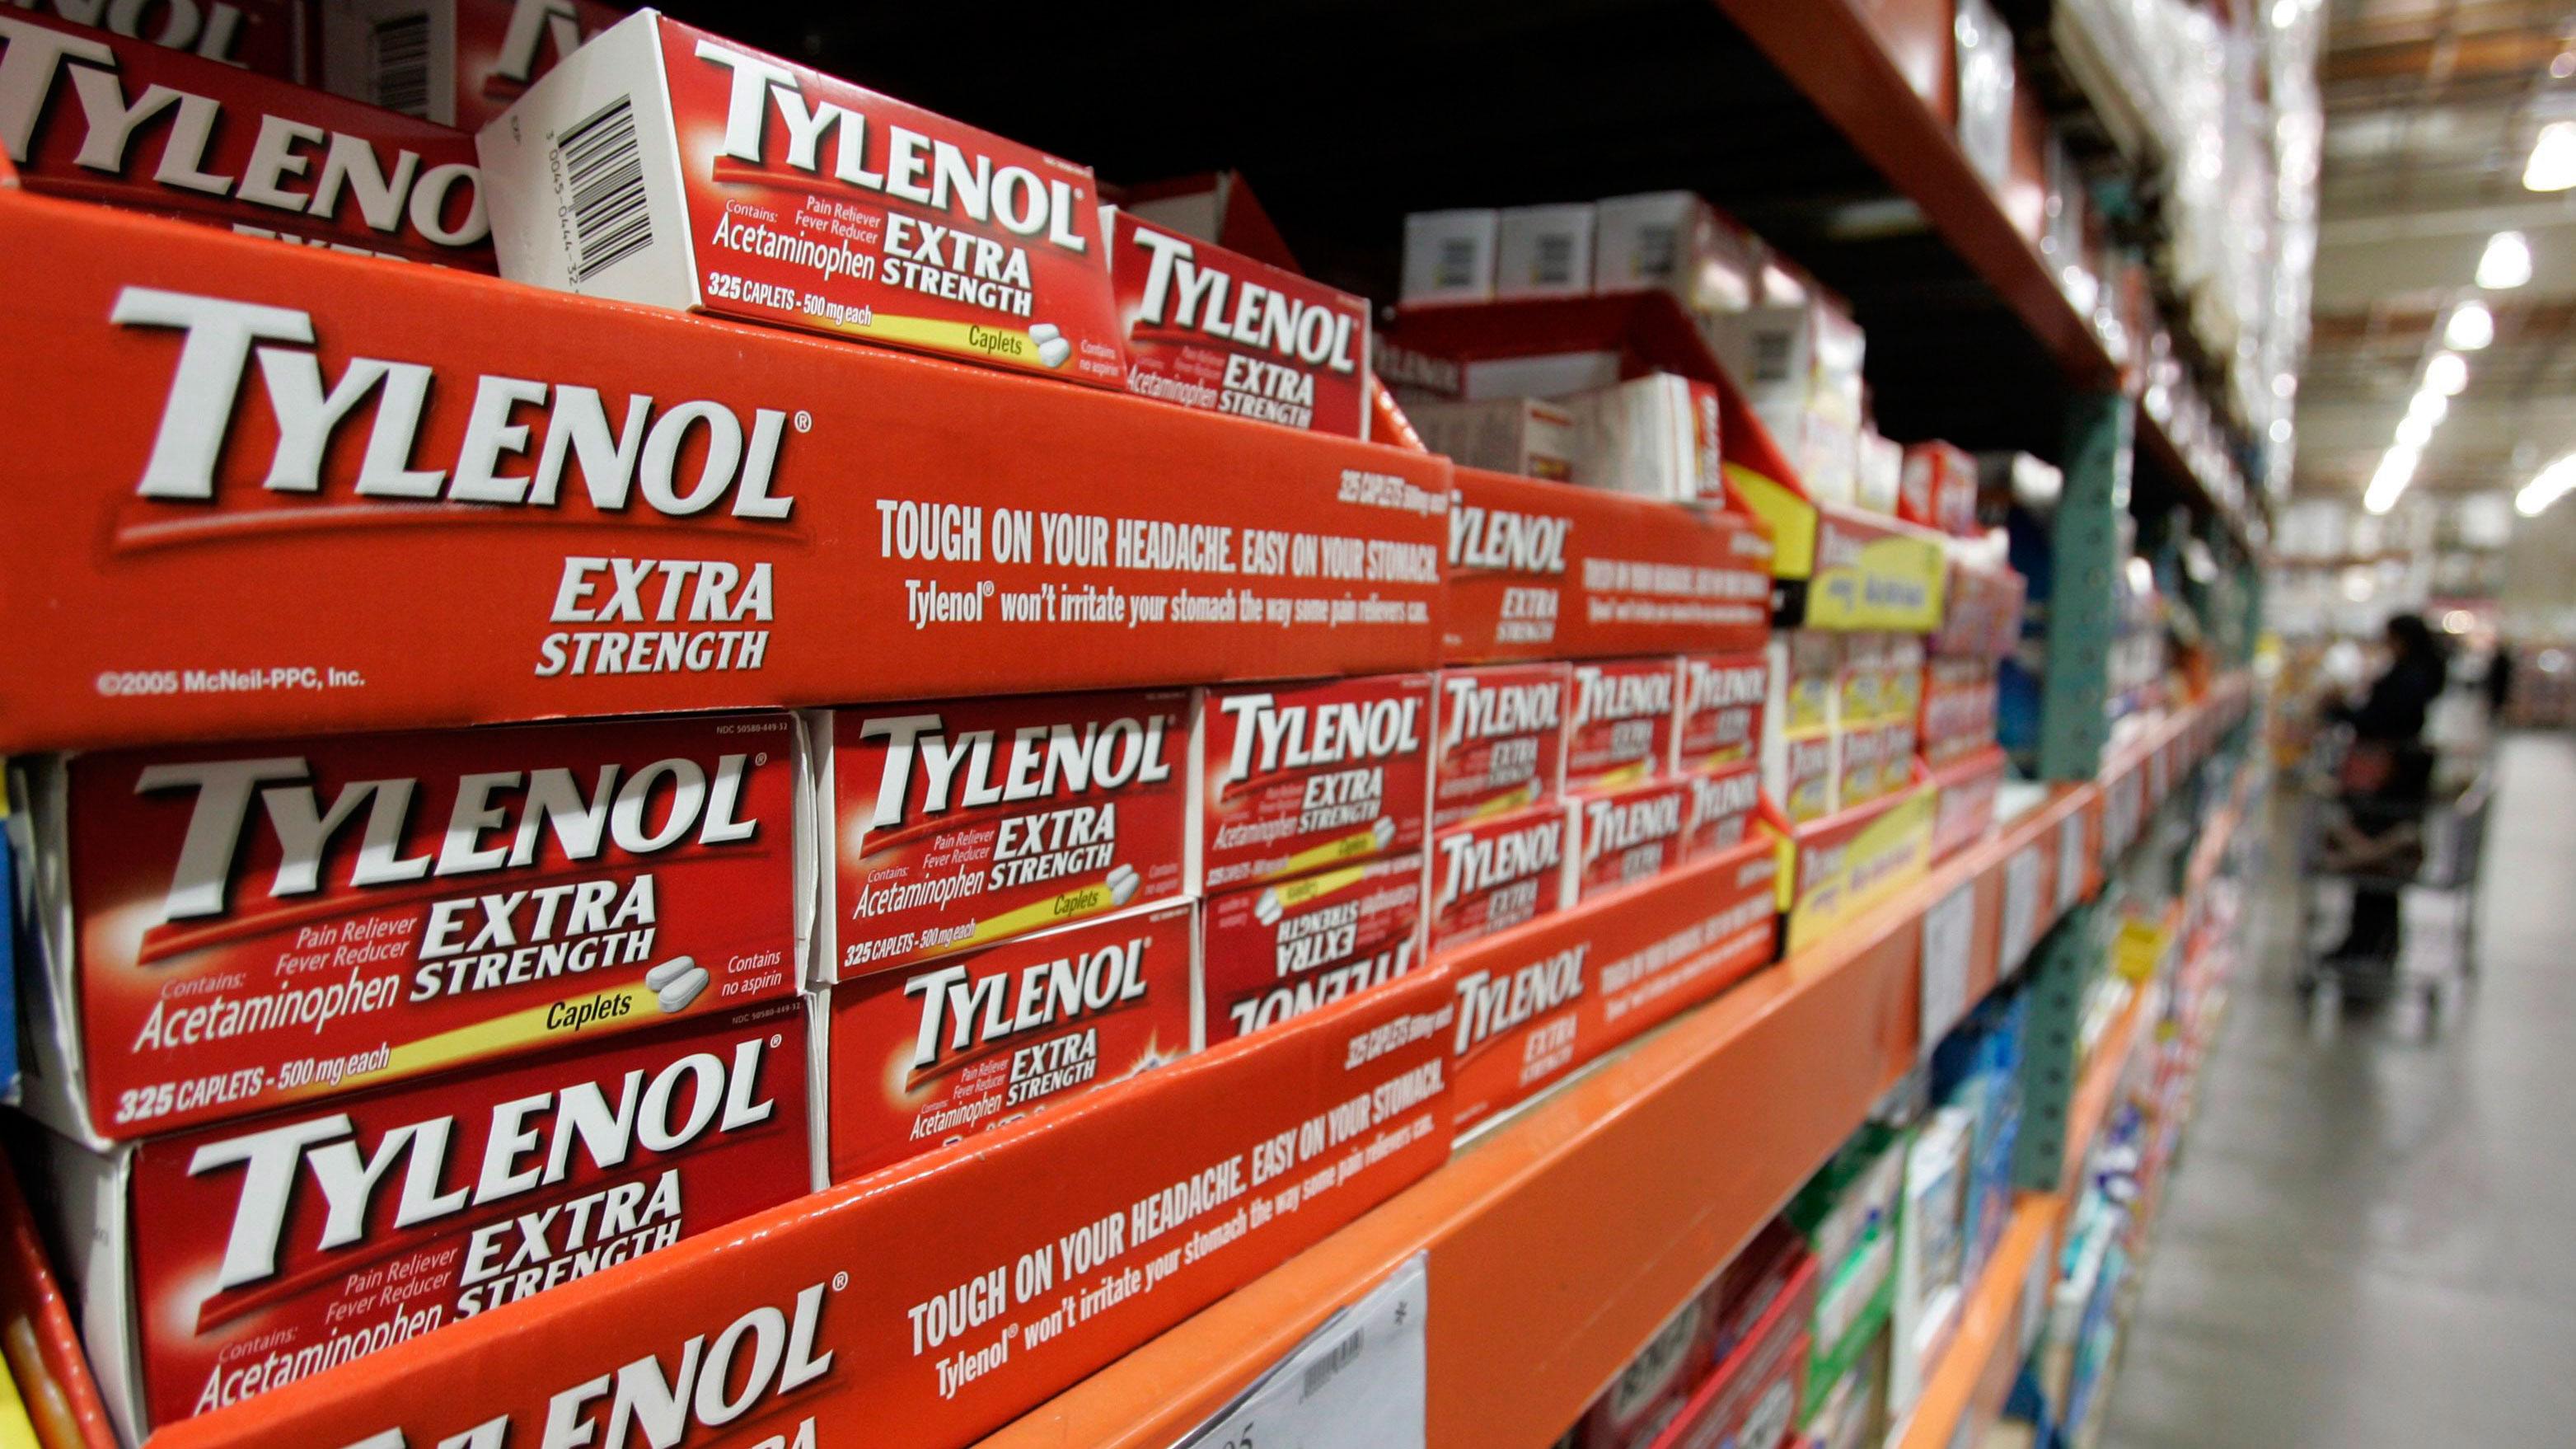 The tylenol murders